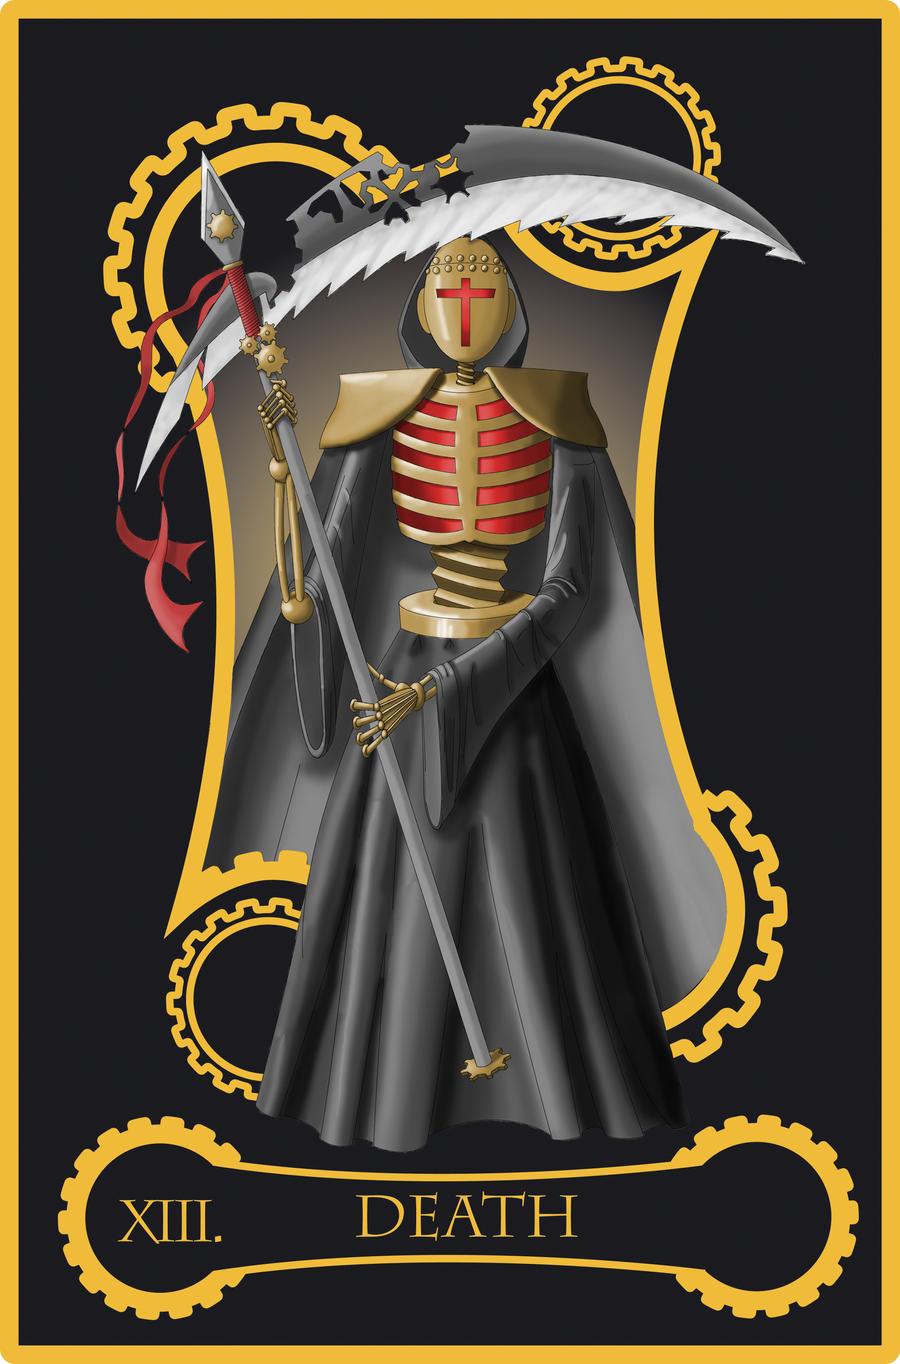 Steampunk Tarot Of Death By Flamarahalvorsen On DeviantArt